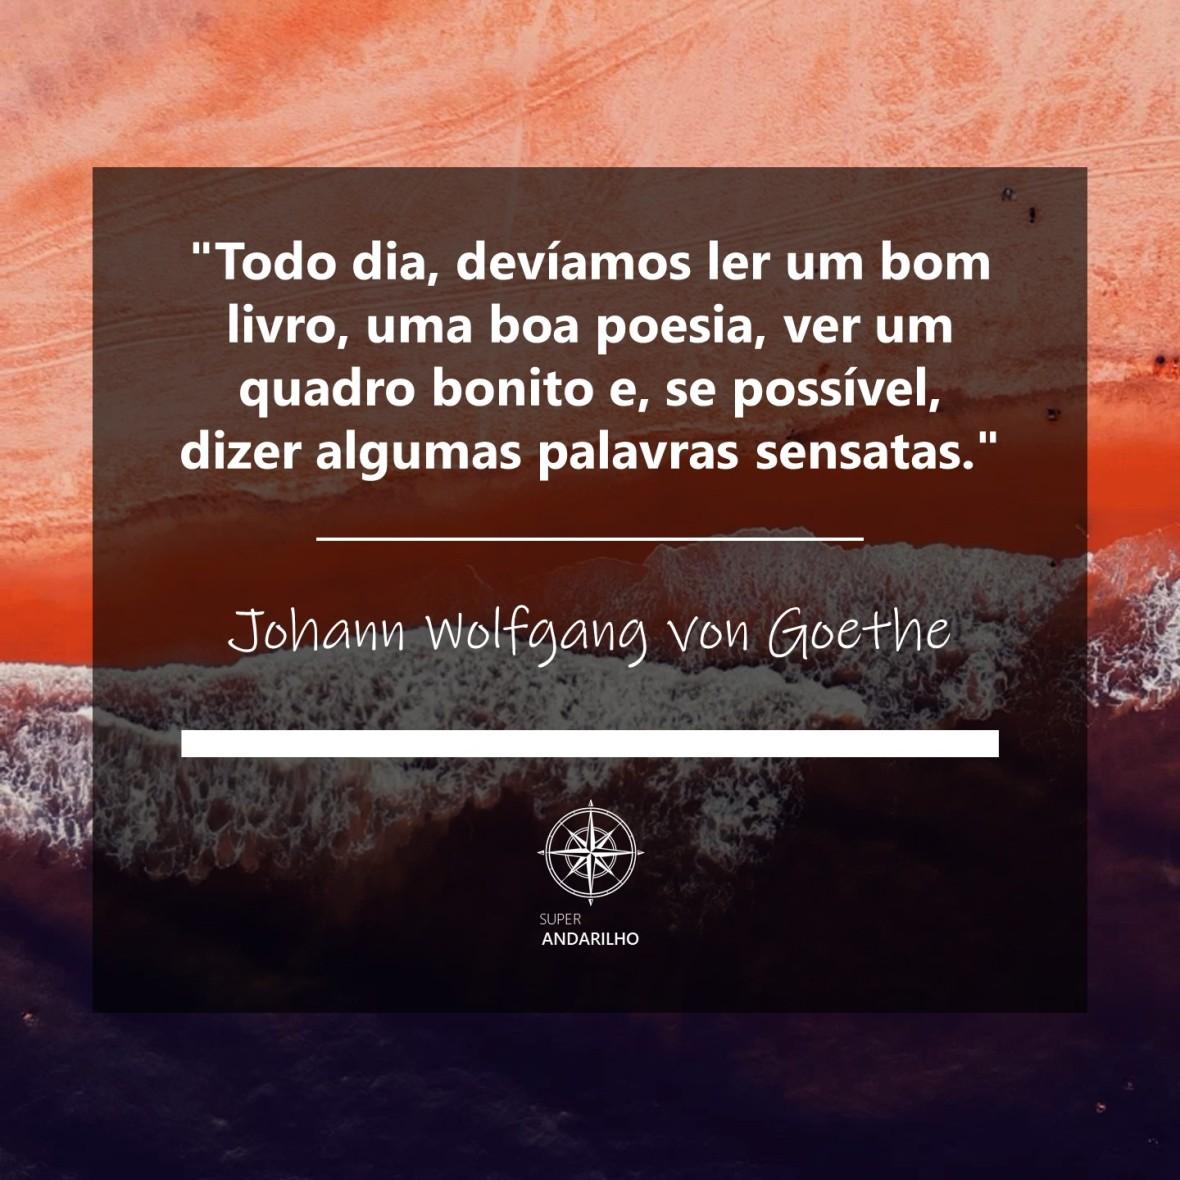 Citação 34A (Johann Wolfgang von Goethe)